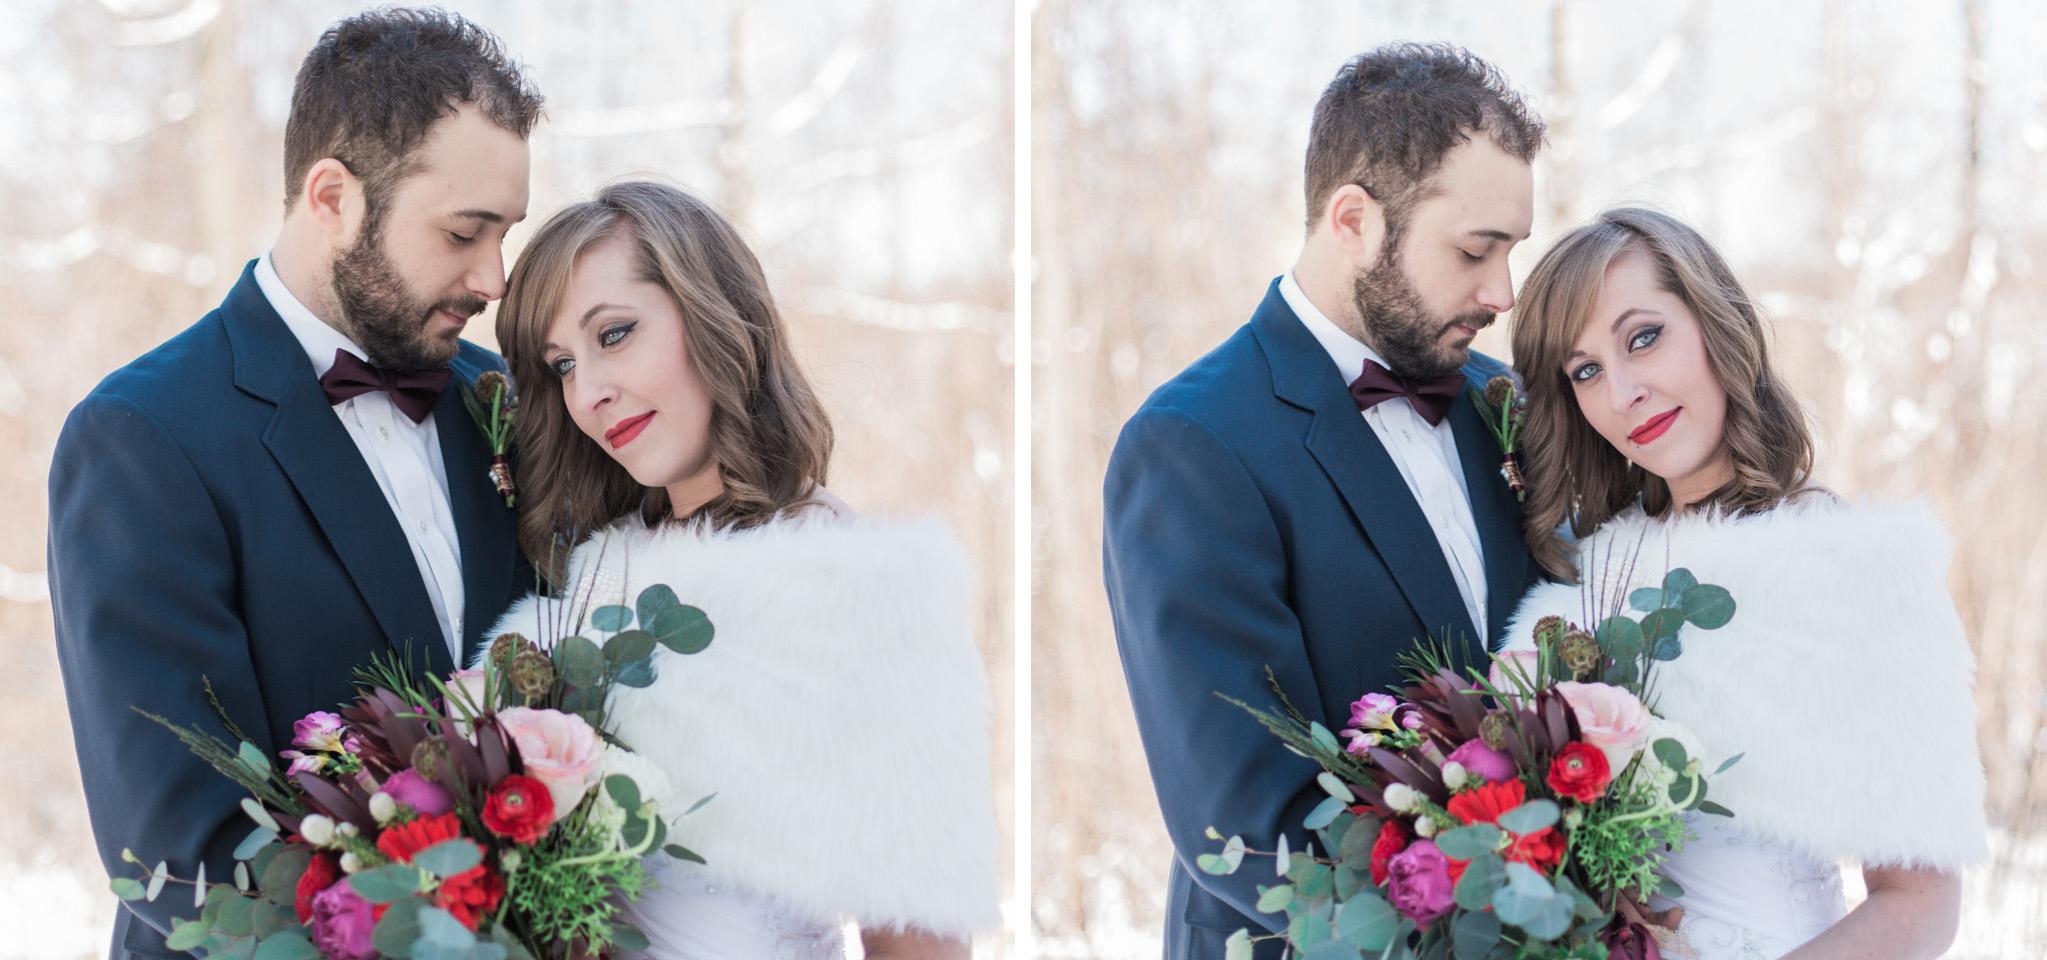 Boho geometric winter wedding styled shoot (31).jpg